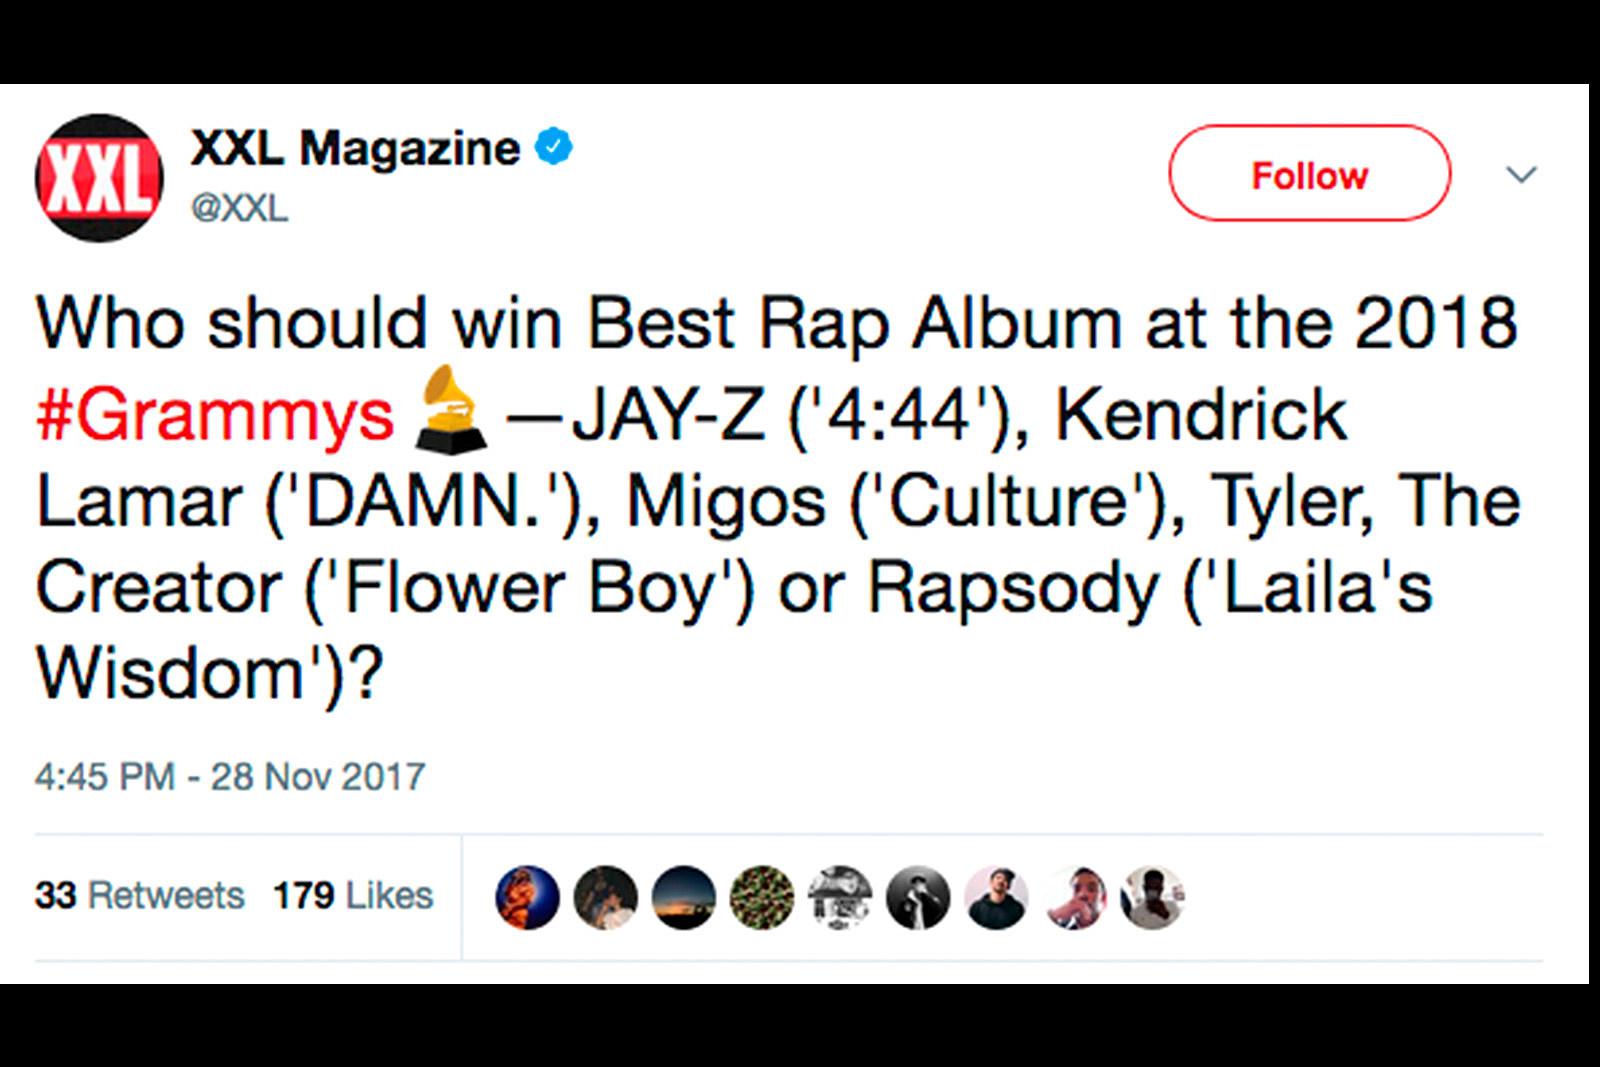 Fans Choose the Rapper to Win Best Rap Album at 2018 Grammys